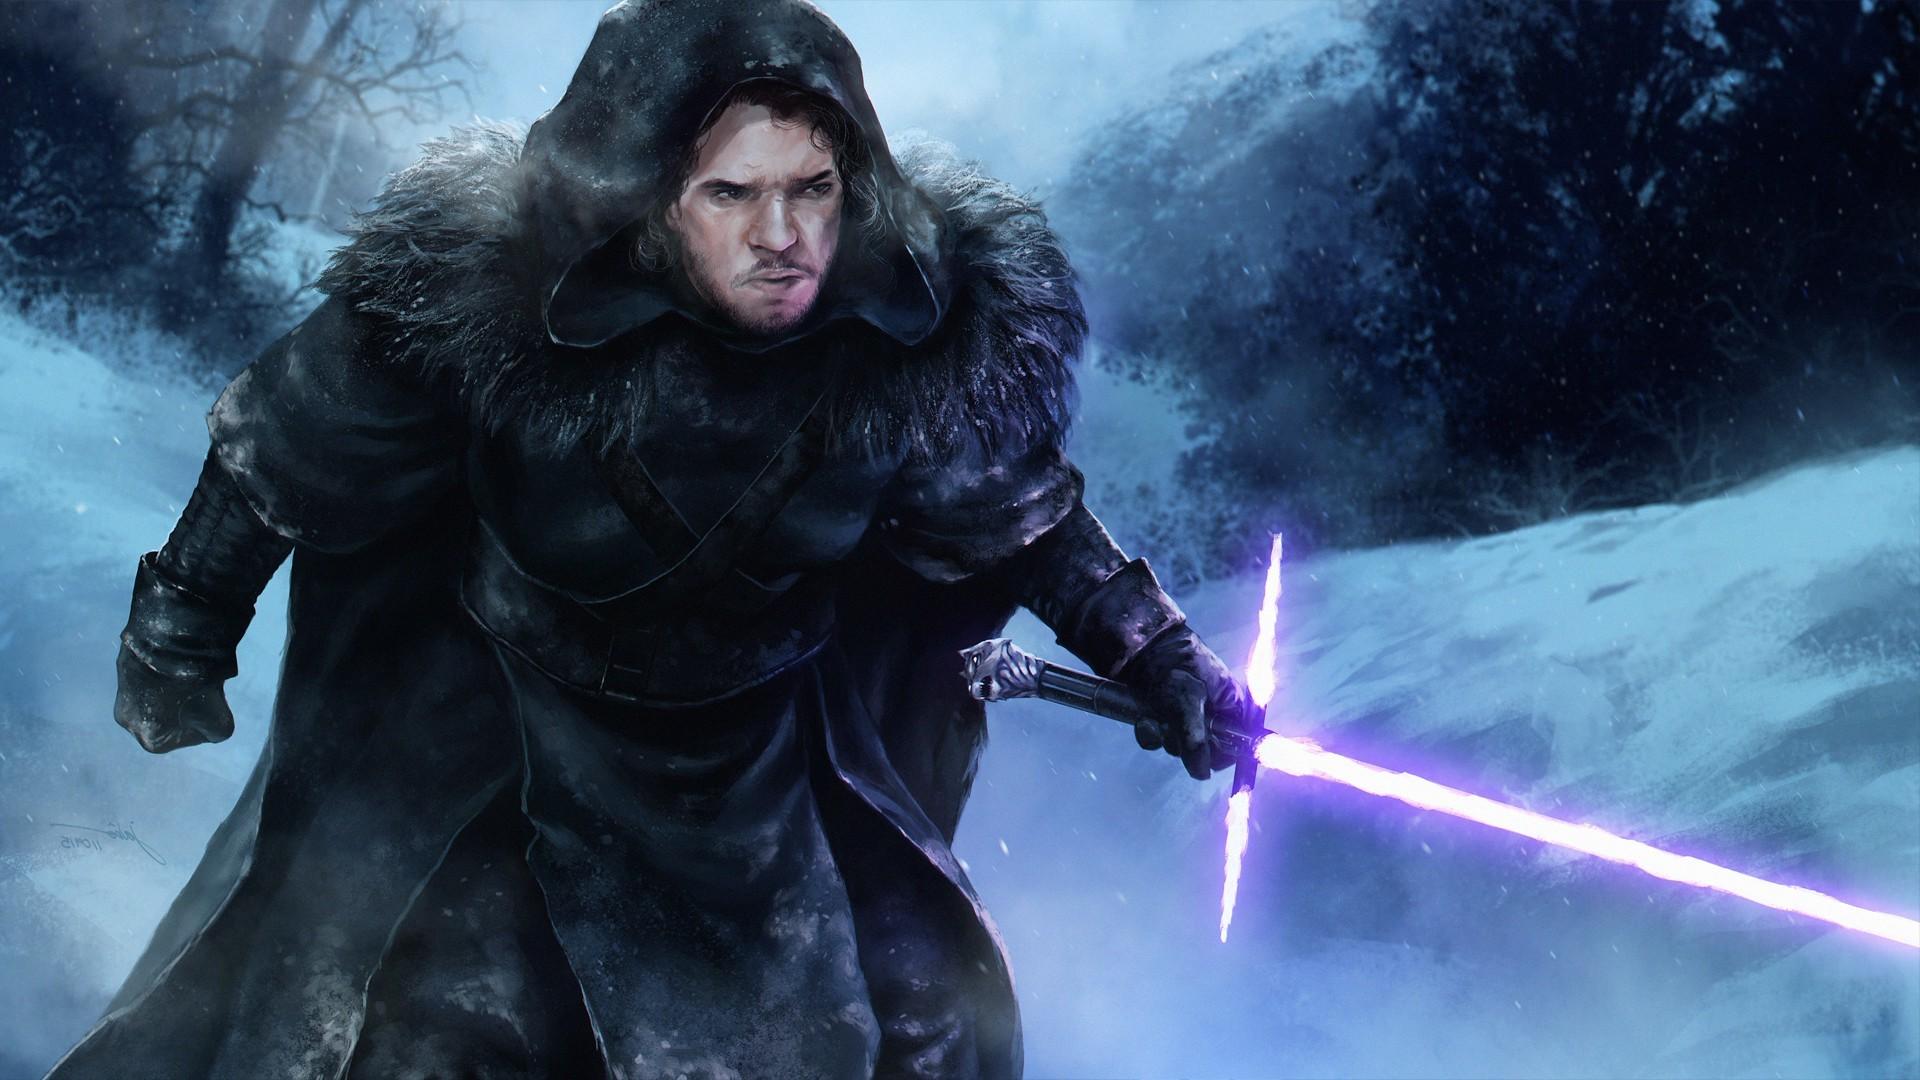 Star Wars, Game Of Thrones, Jon Snow, Artwork, Fantasy Art, Lightsaber Wallpapers  HD / Desktop and Mobile Backgrounds